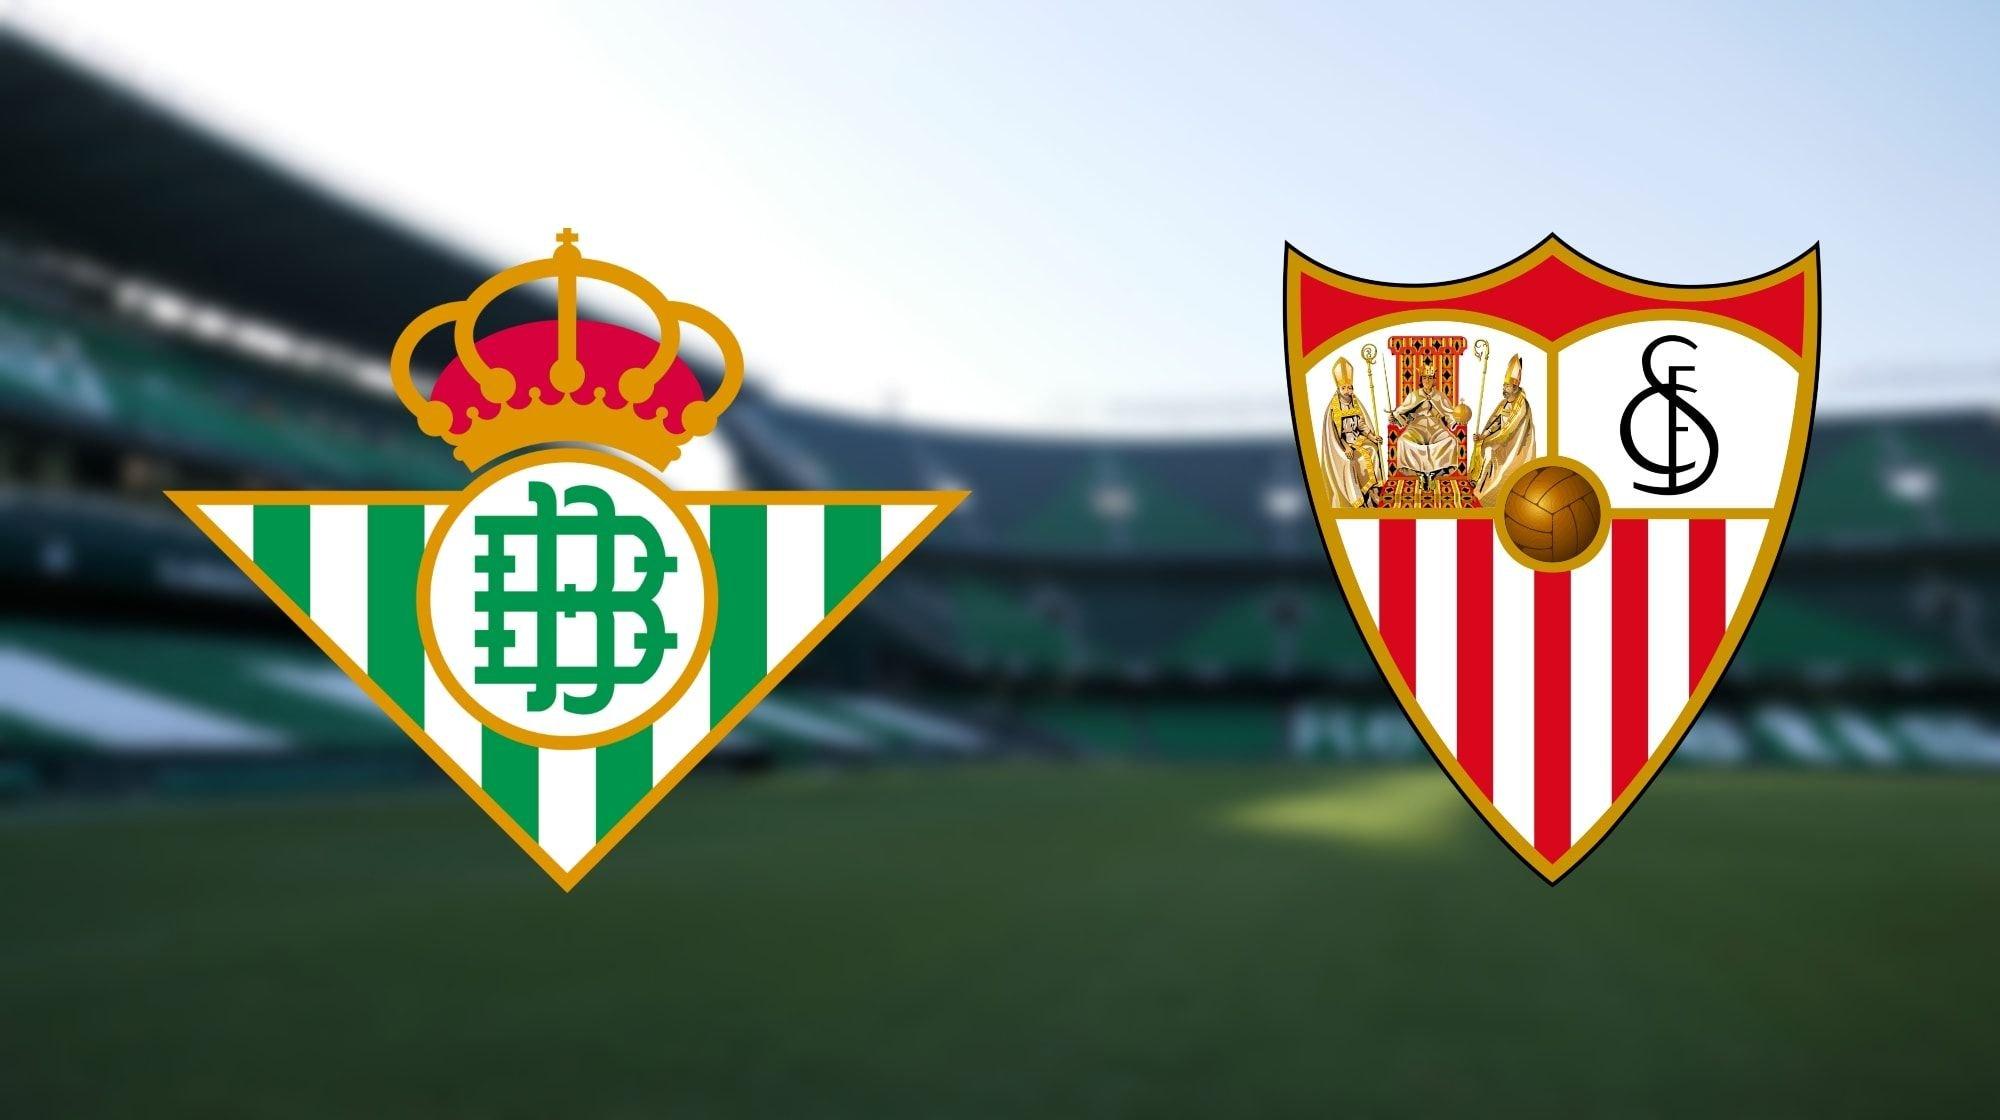 Real Betis vs Sevilla Prediction: 10.11.2019 La Liga Match